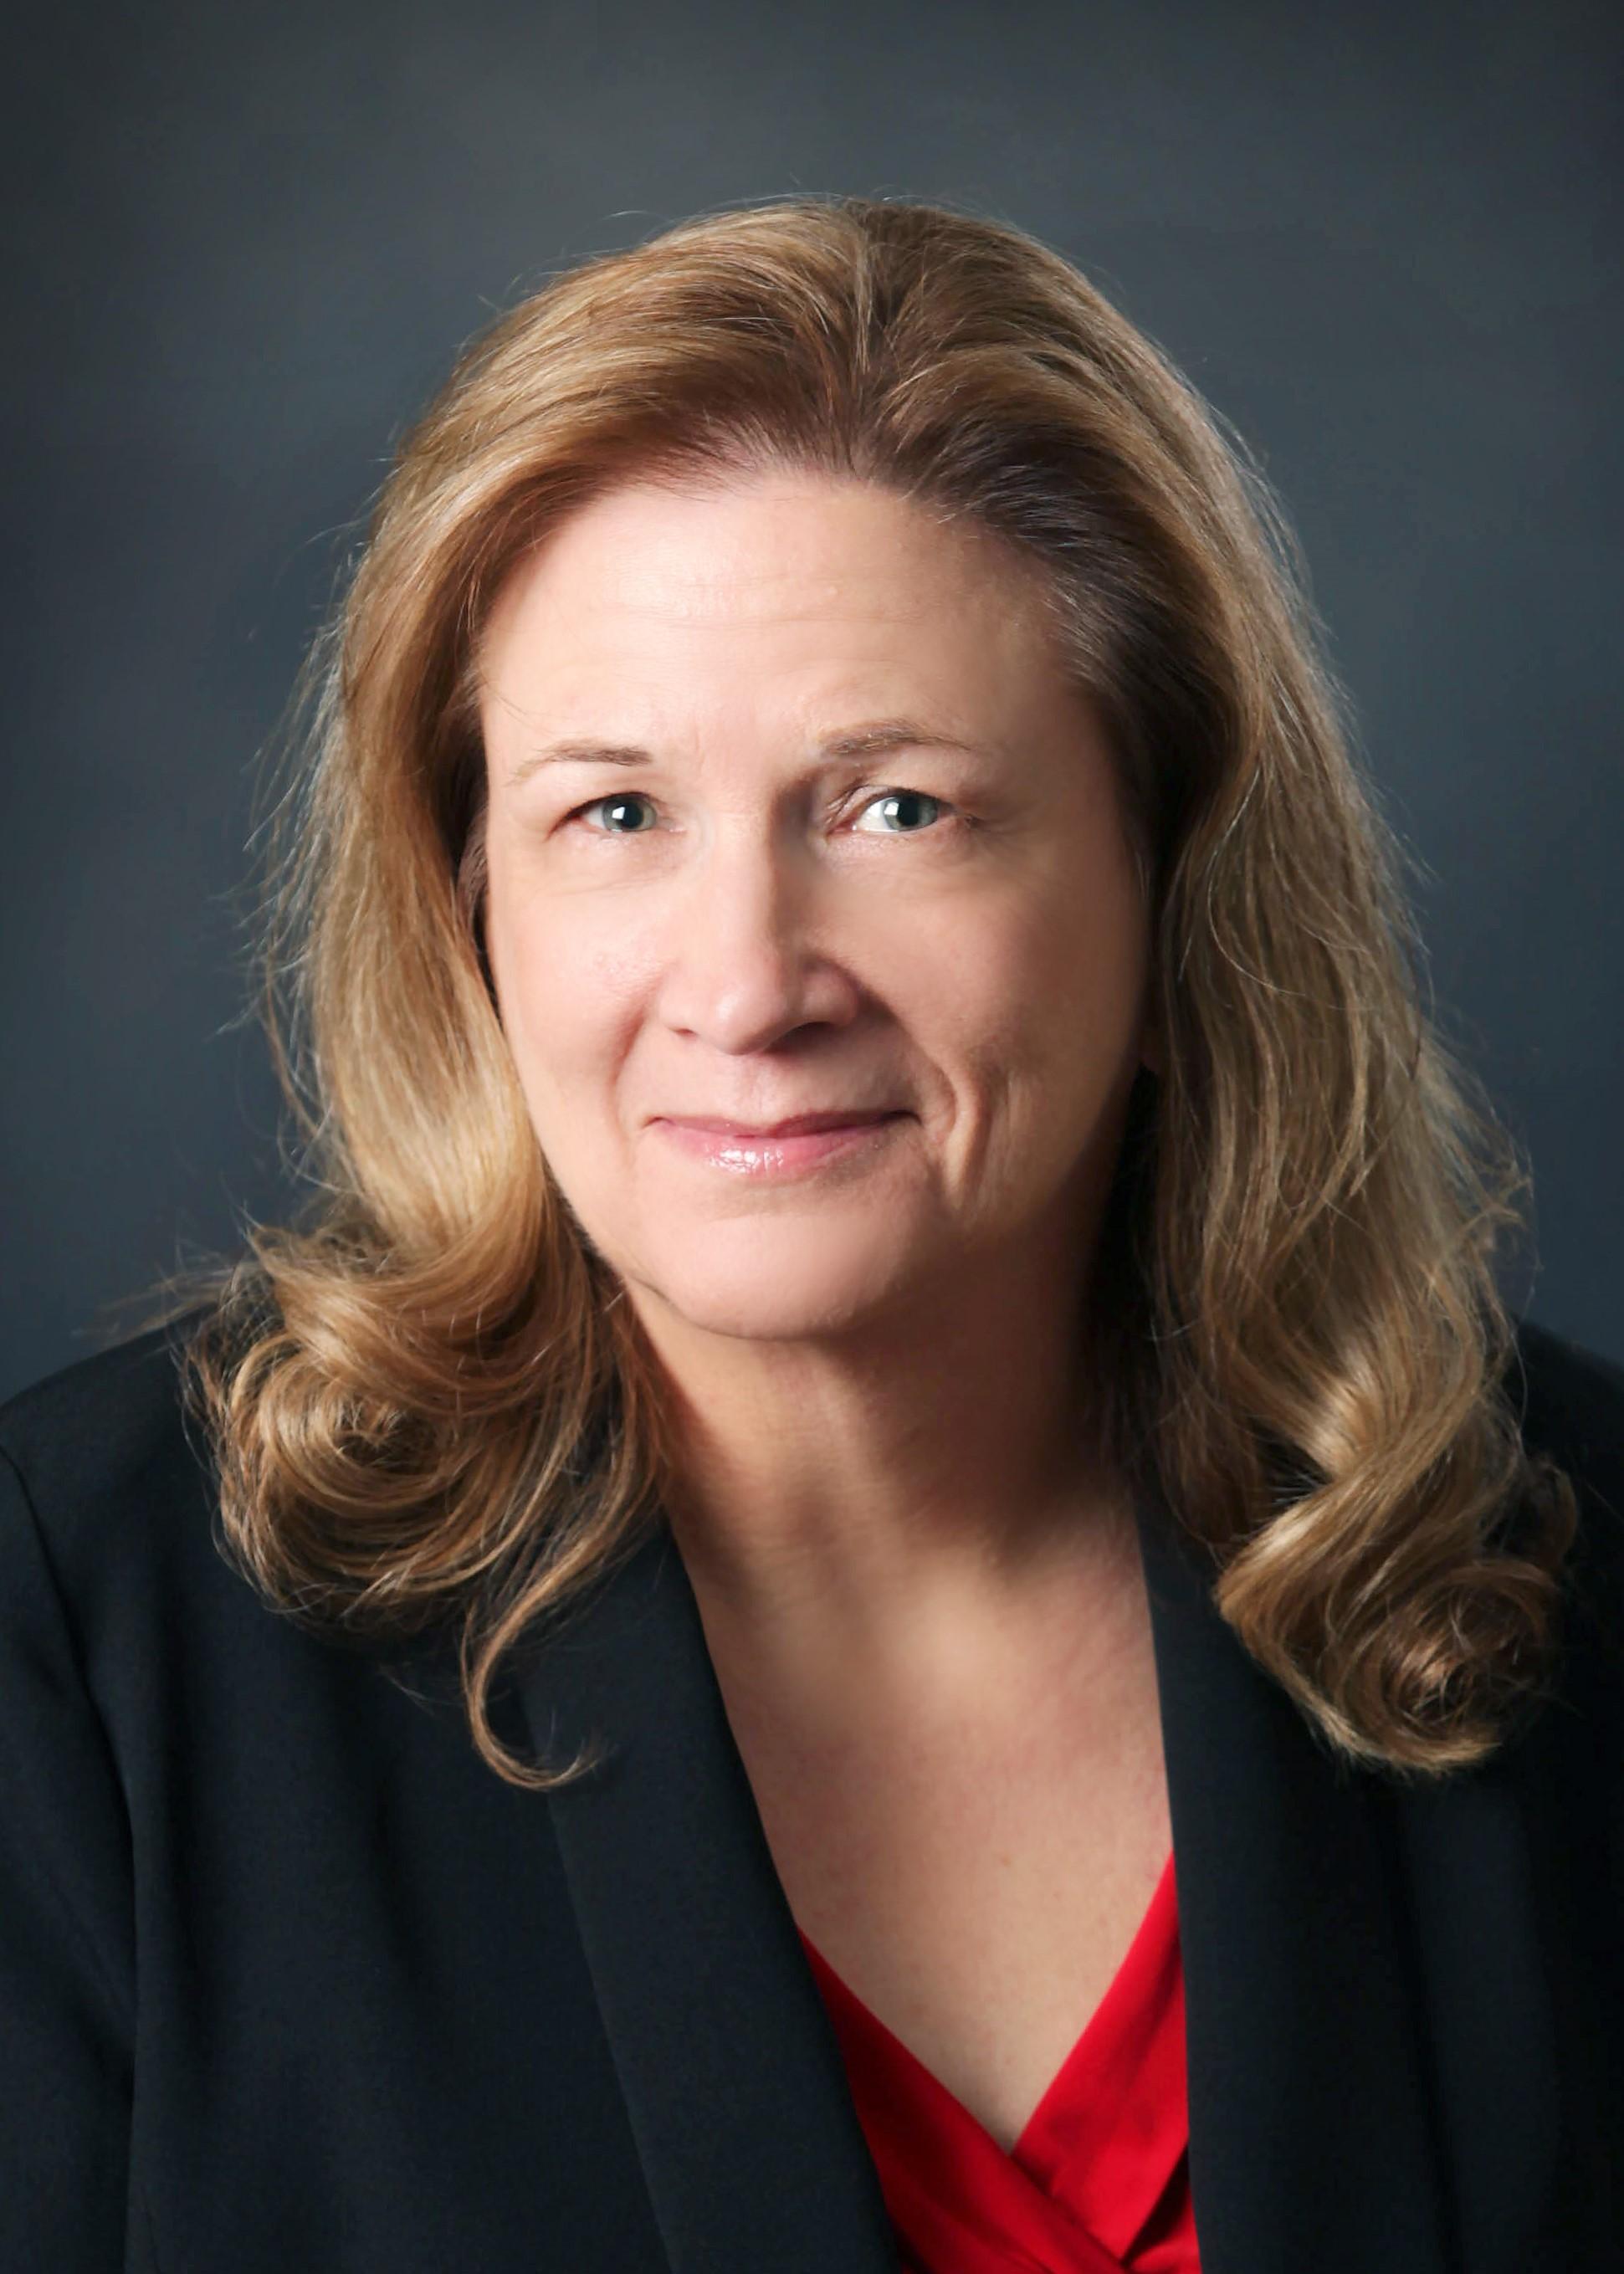 Kathy Short VP, Human Resources